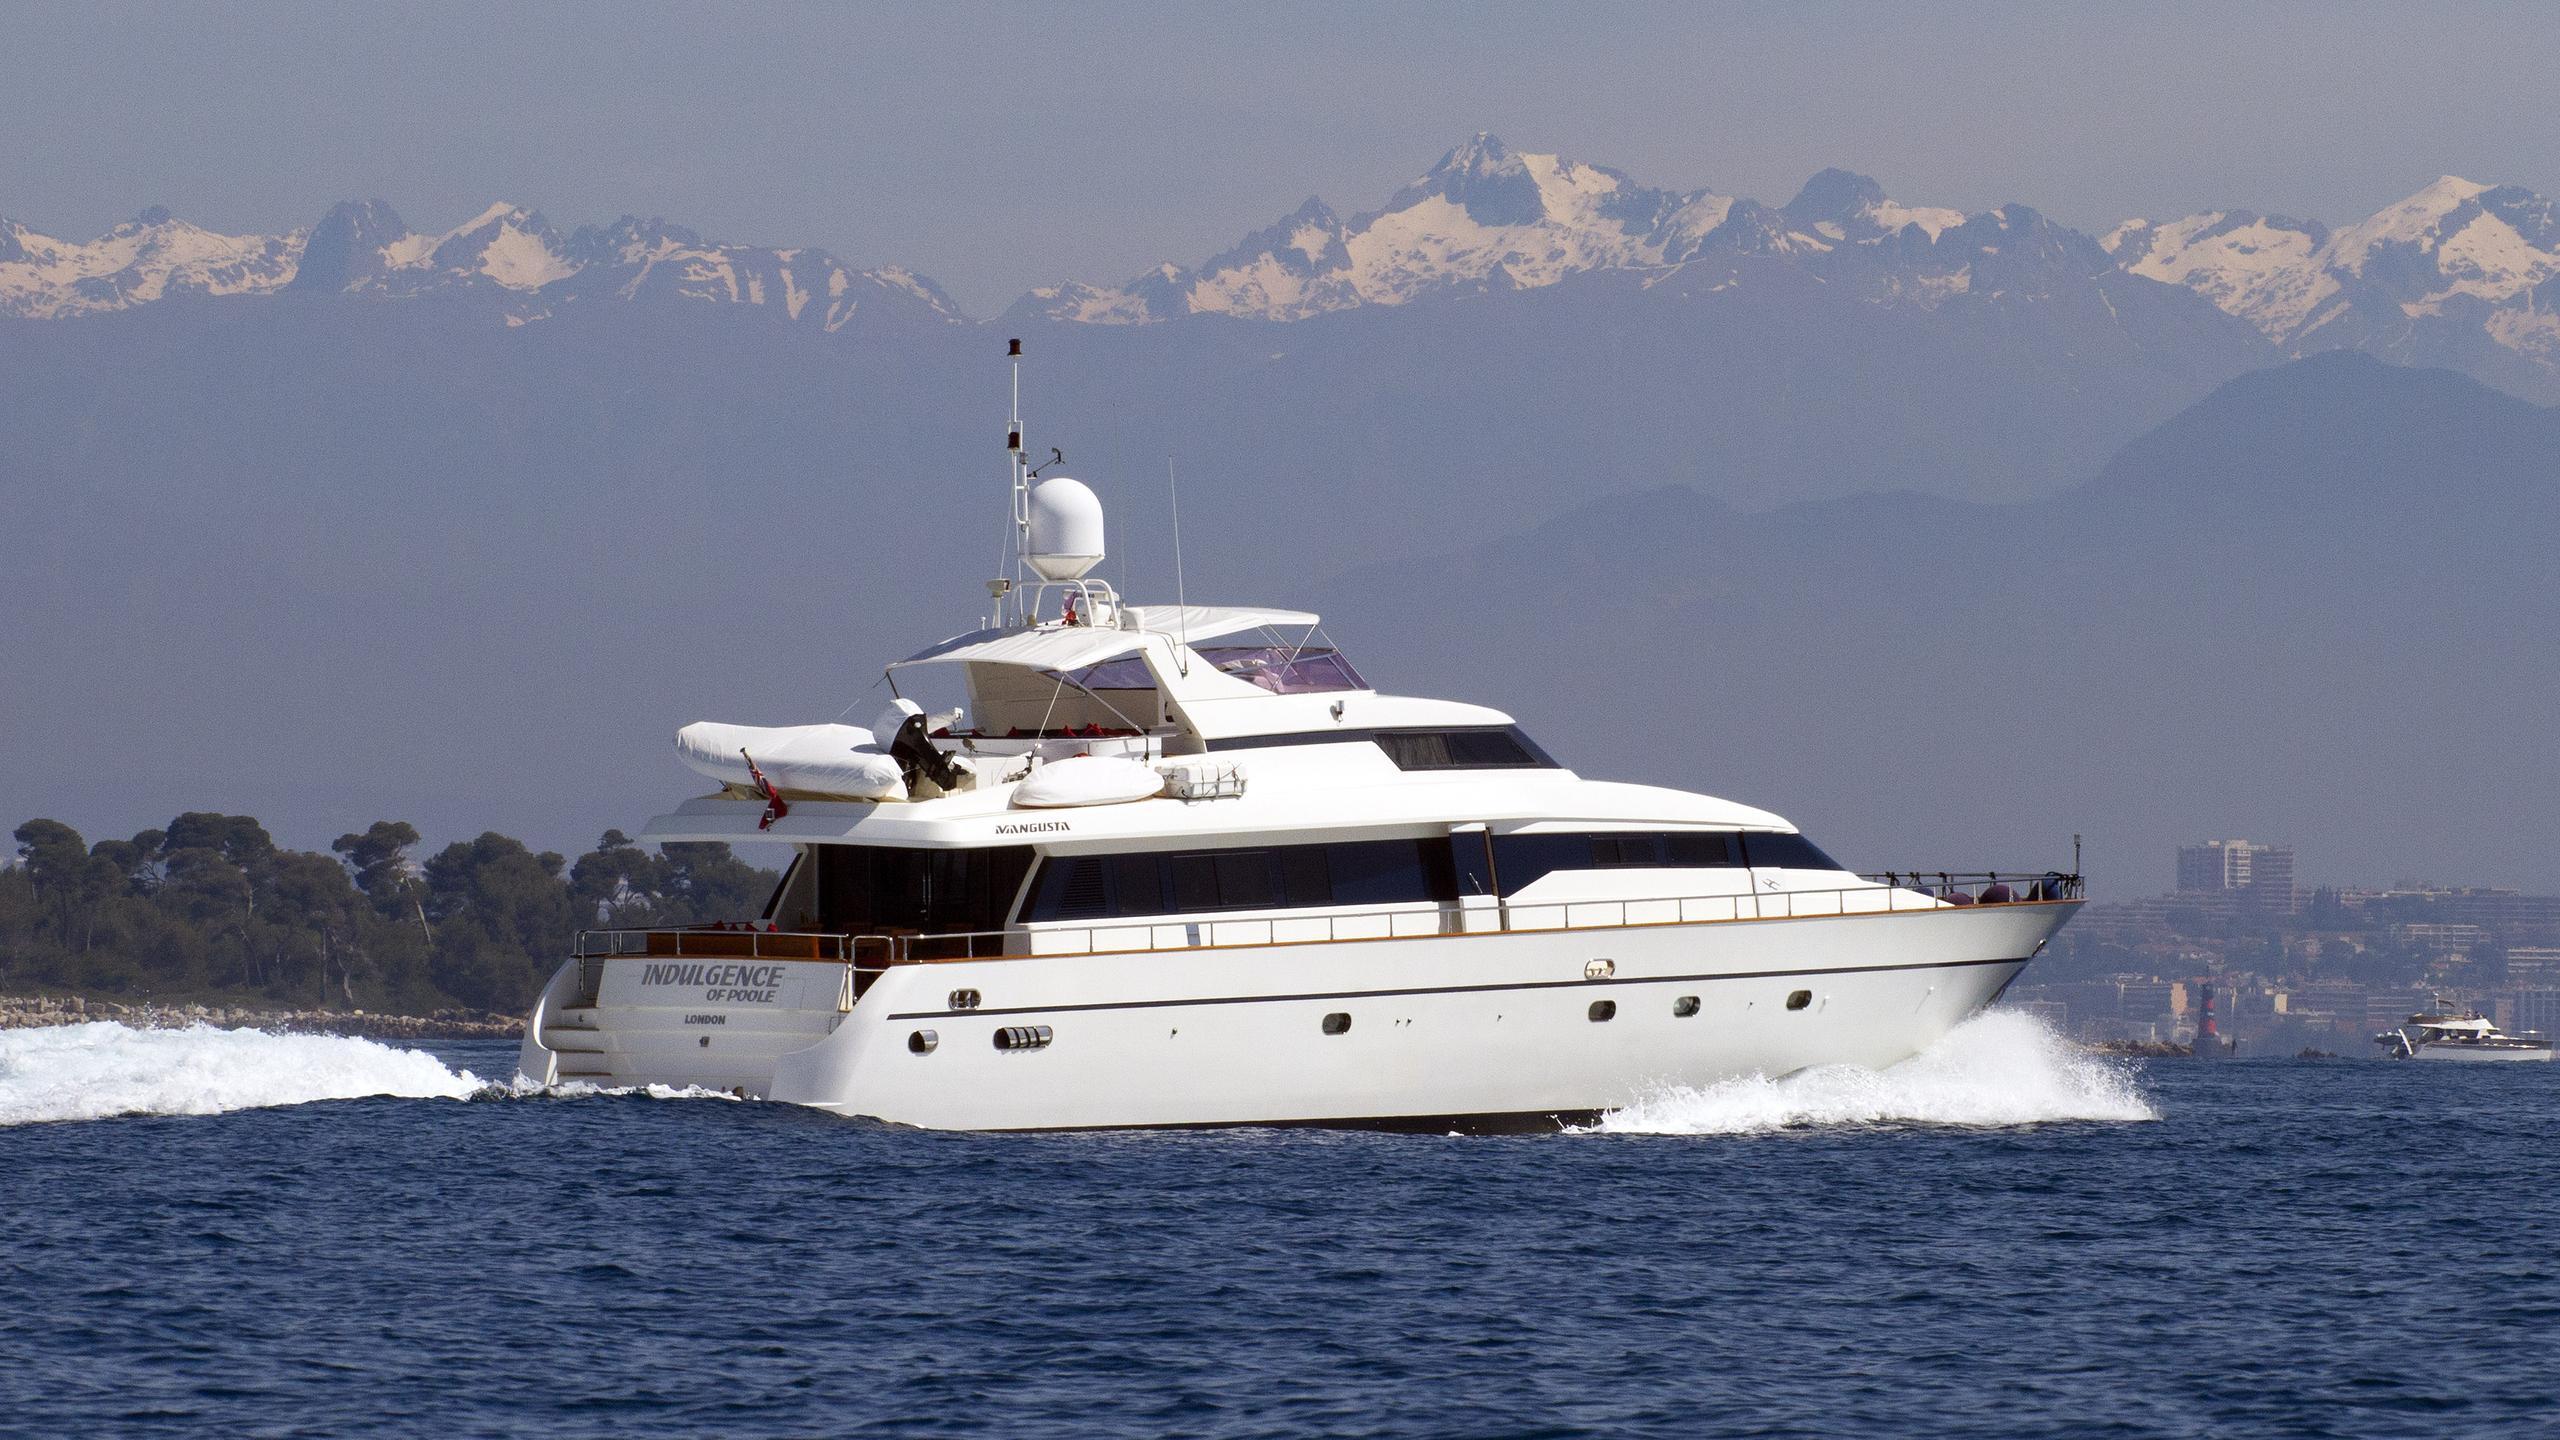 indulgence-of-poole-motor-yacht-versilmarina-1998-26m-running-stern